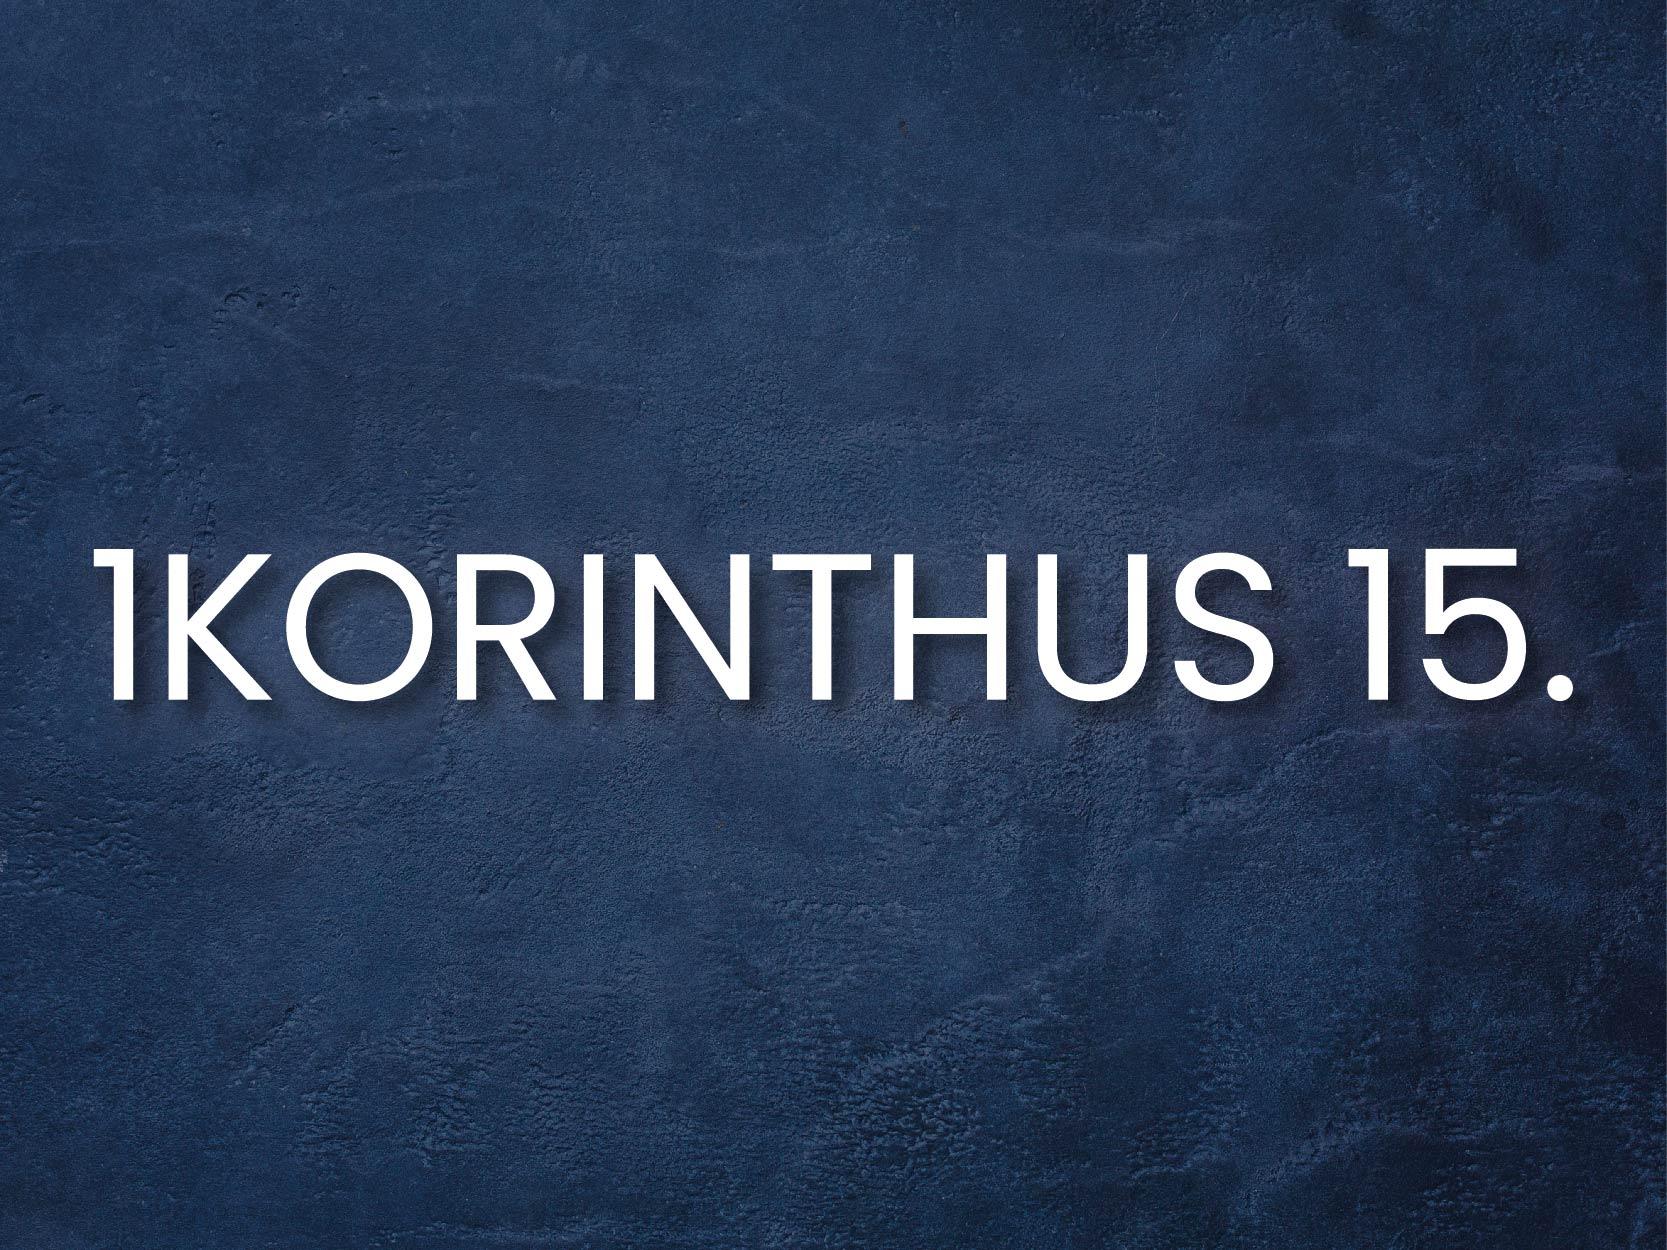 INFO_korinthus_15